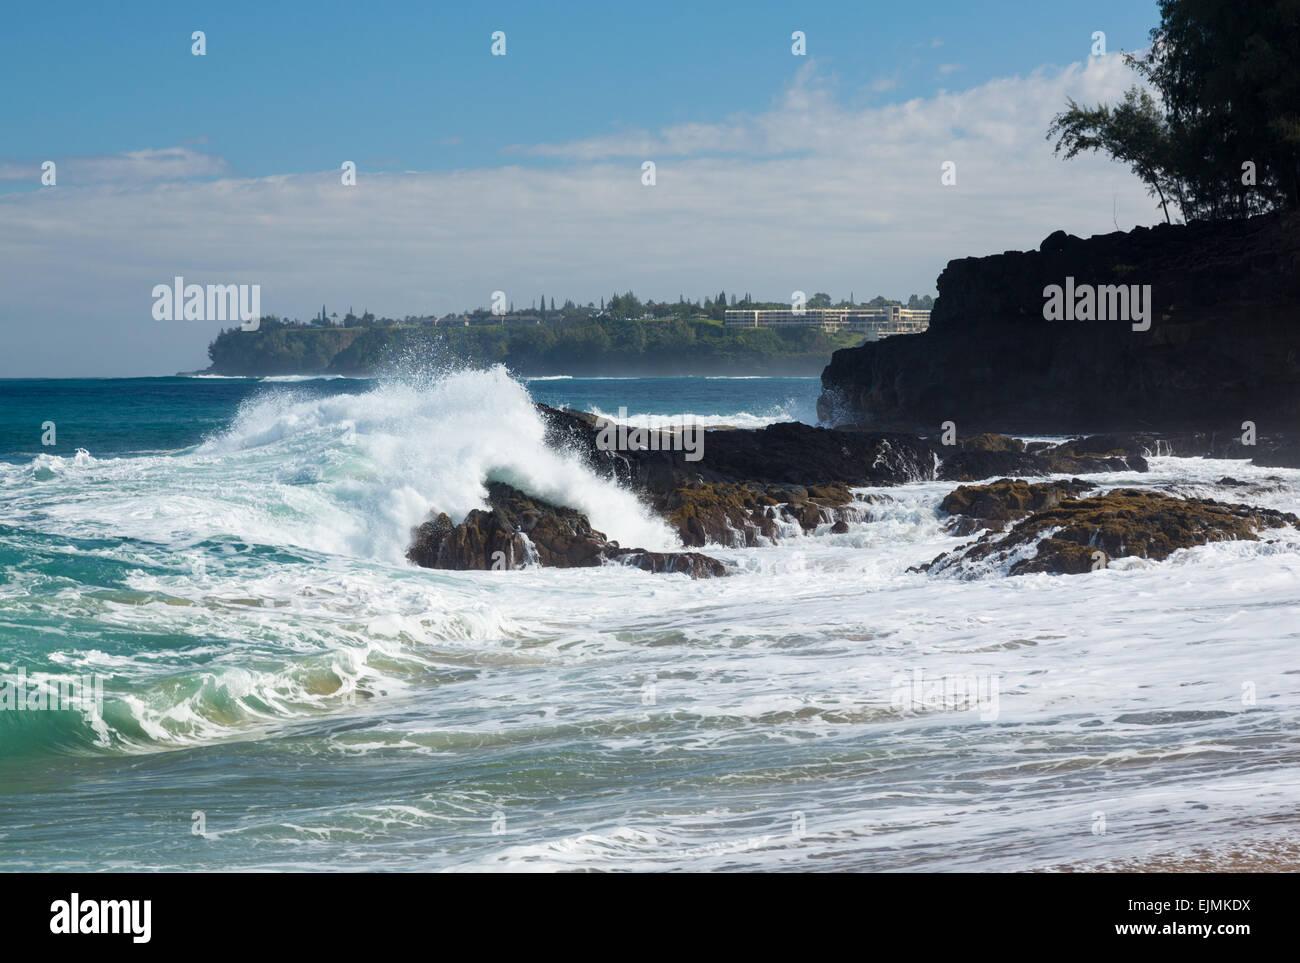 Waves crash onto Lumahai beach with St Regis hotel in background on Kauai Hawaii - Stock Image